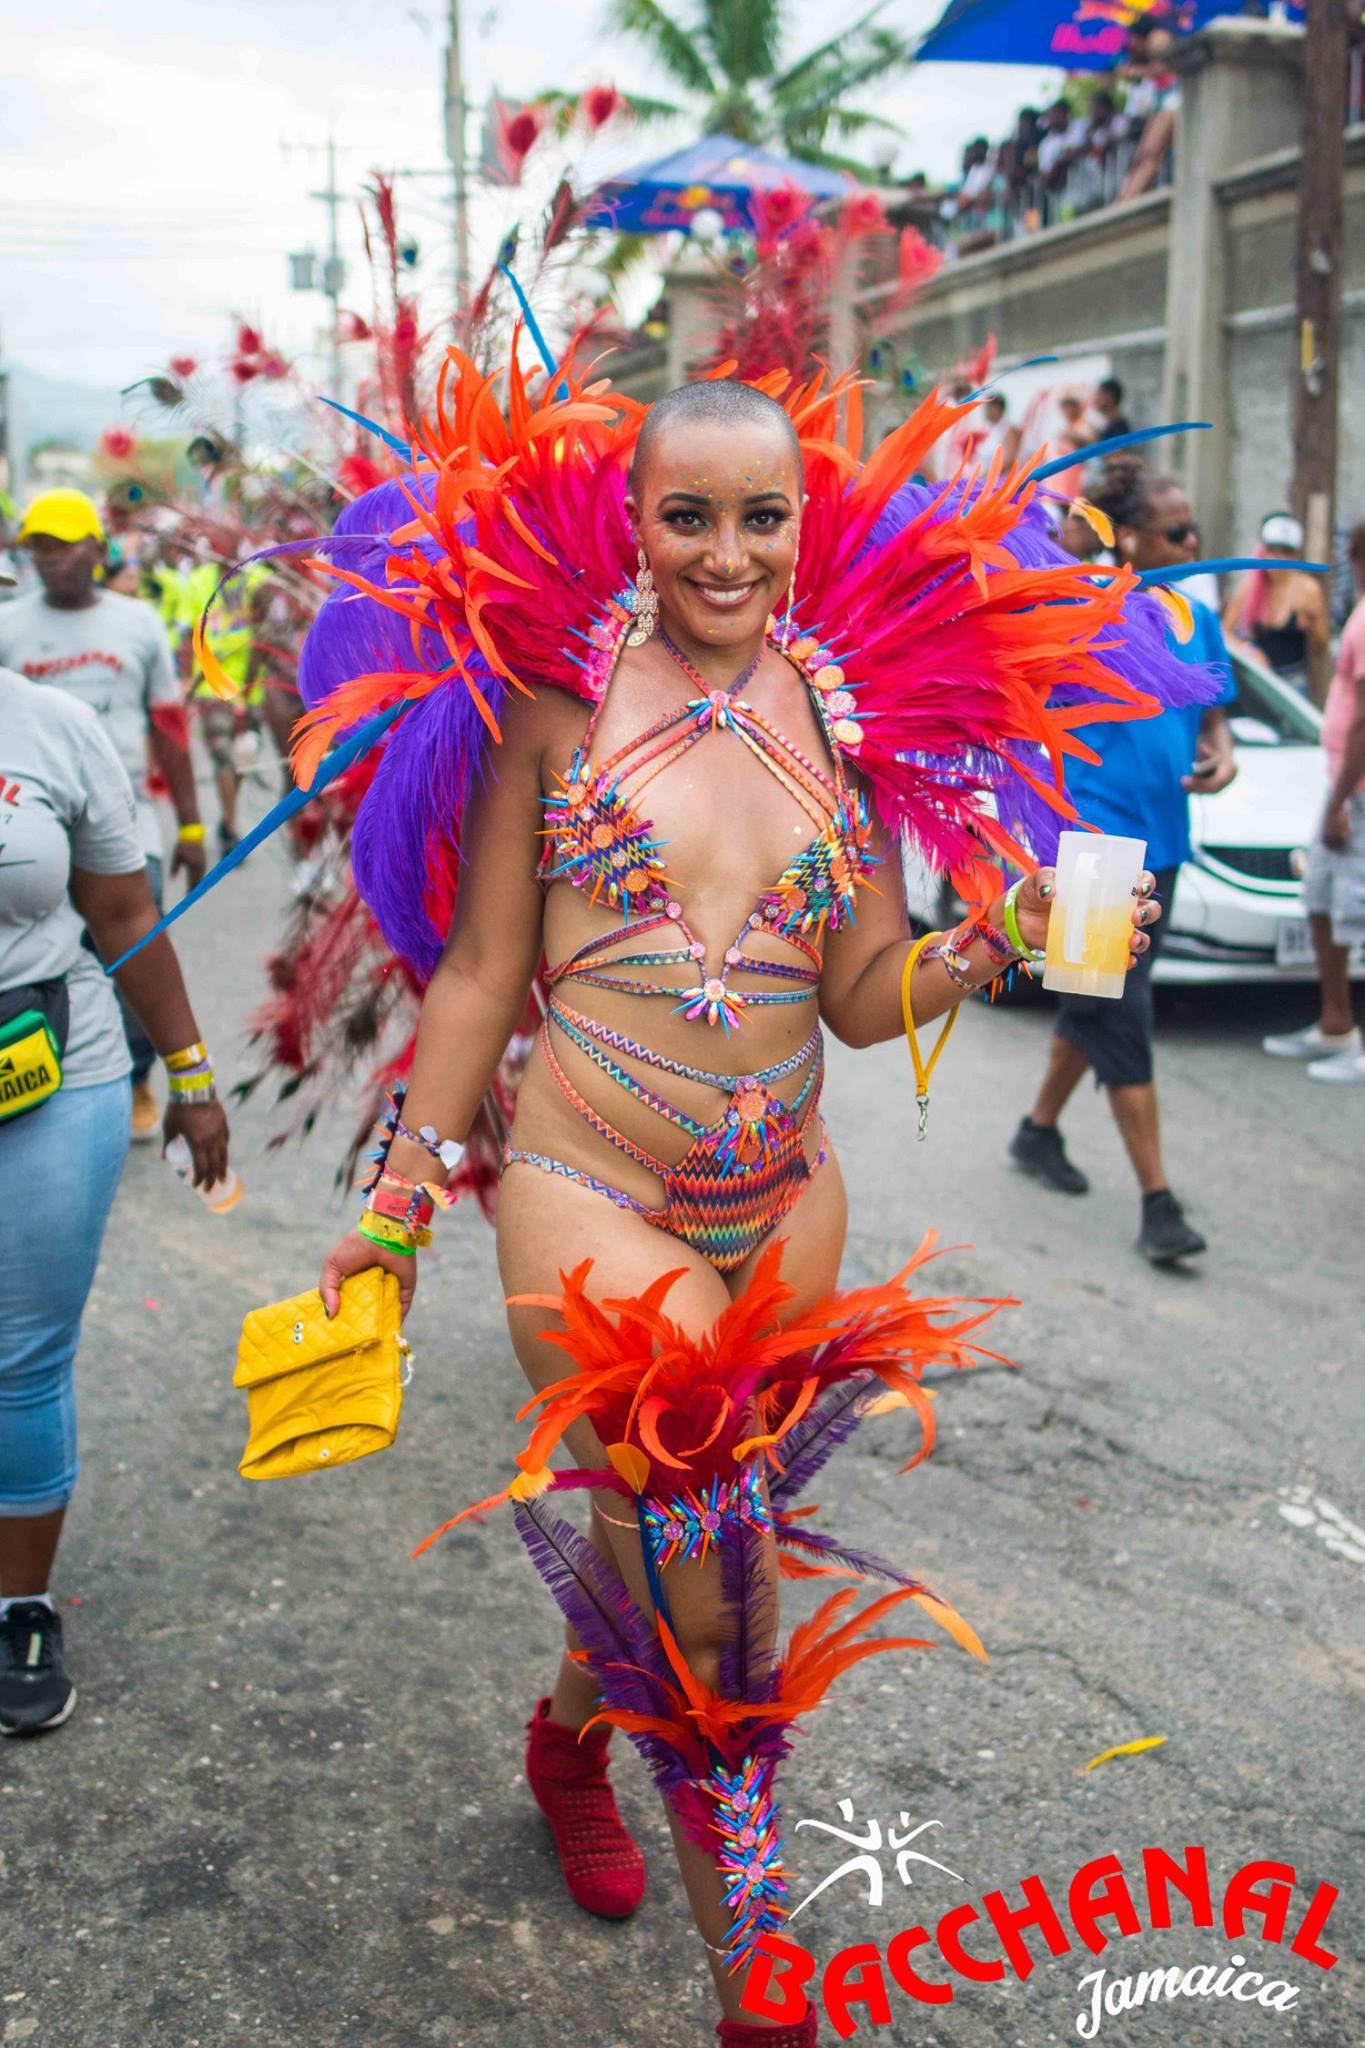 Bacchanal Jamaica 5